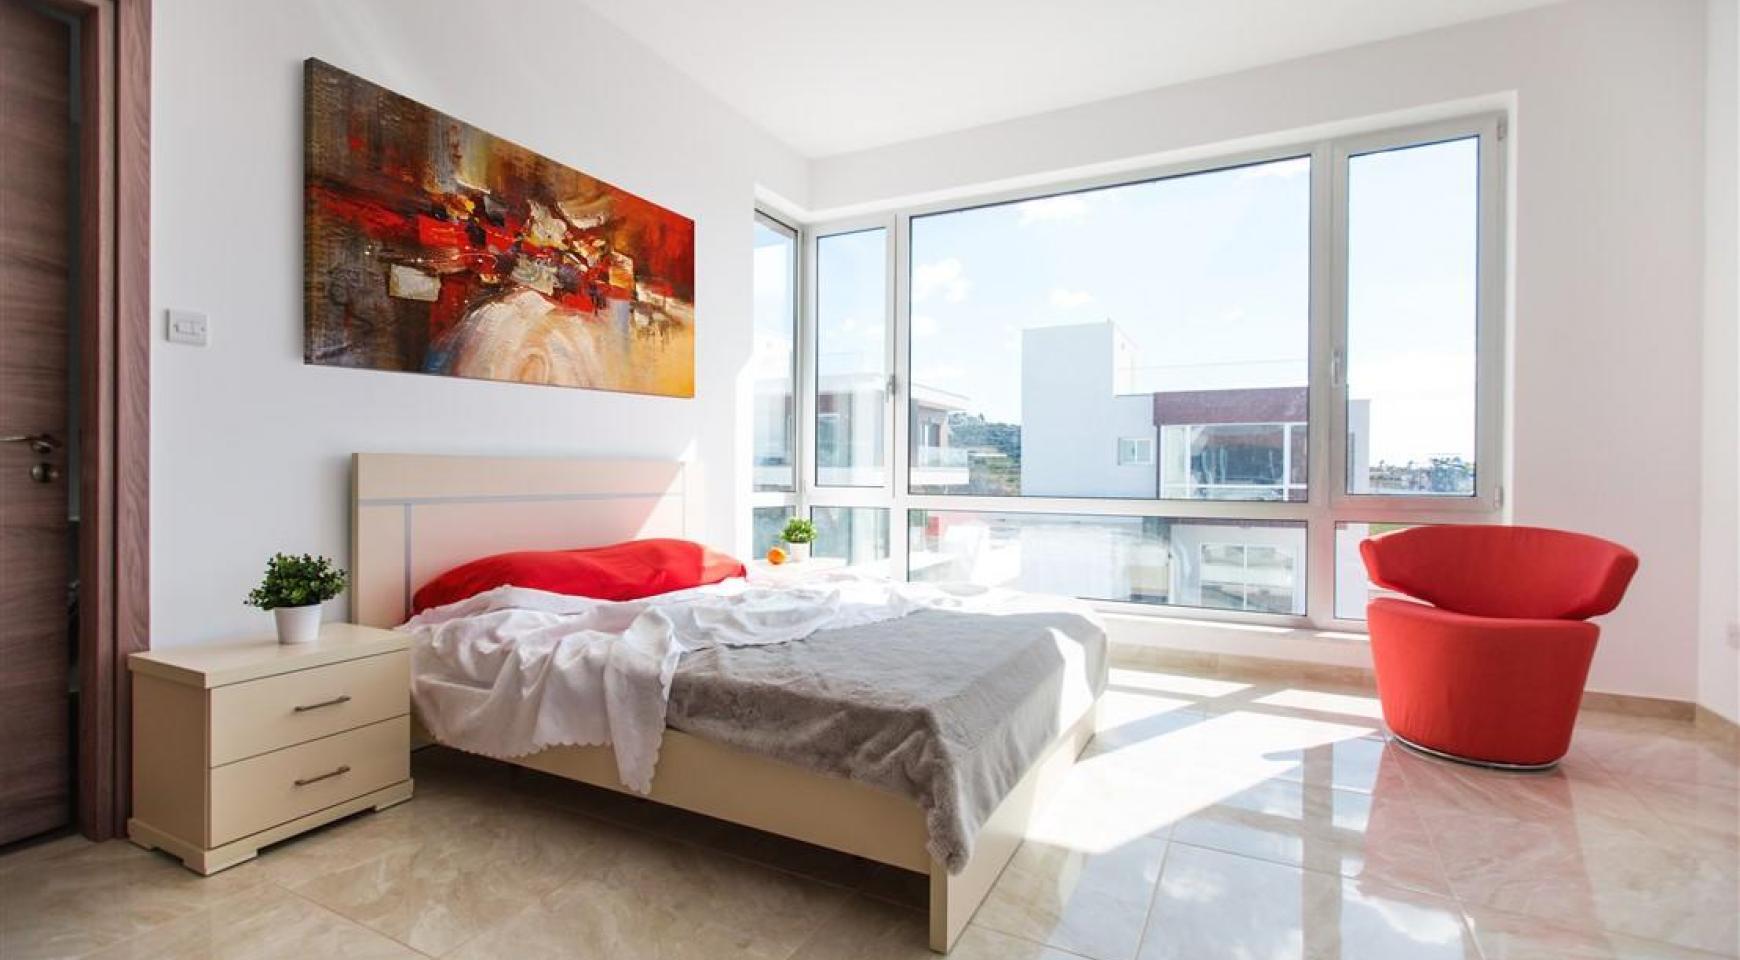 3 Bedroom Villa in Chloraka - 14